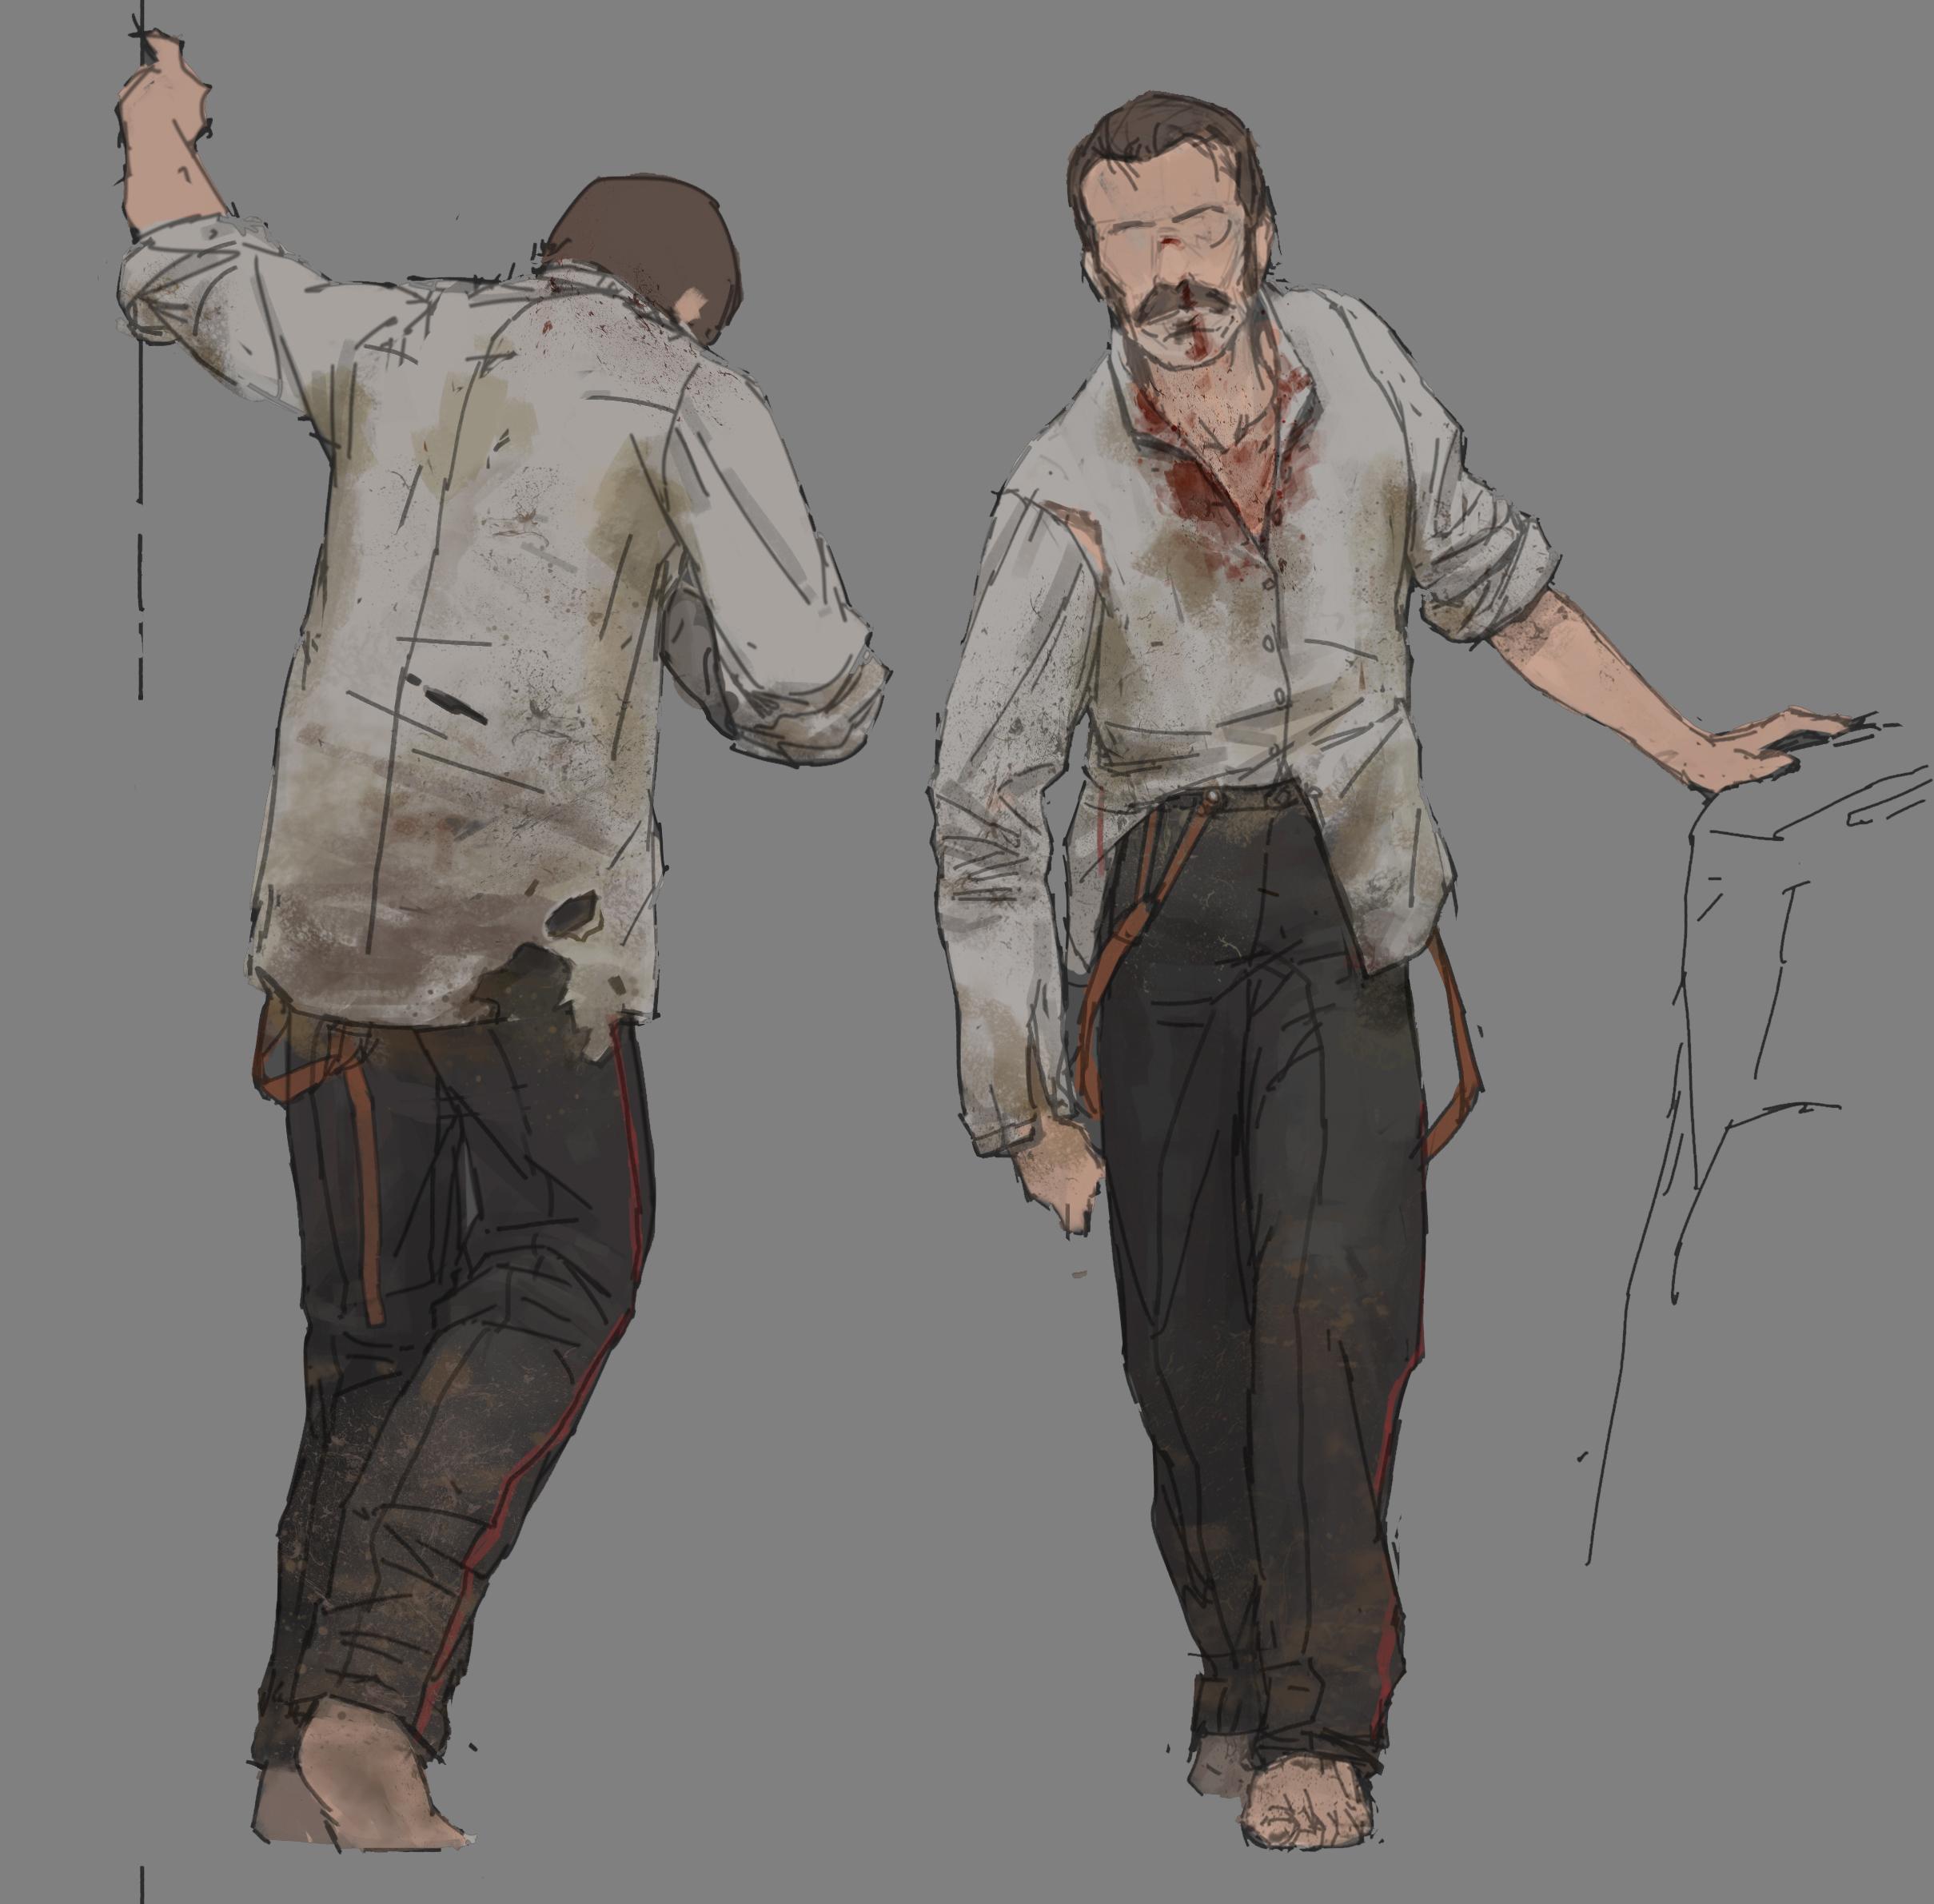 galahad_injured_sketches_02.jpg